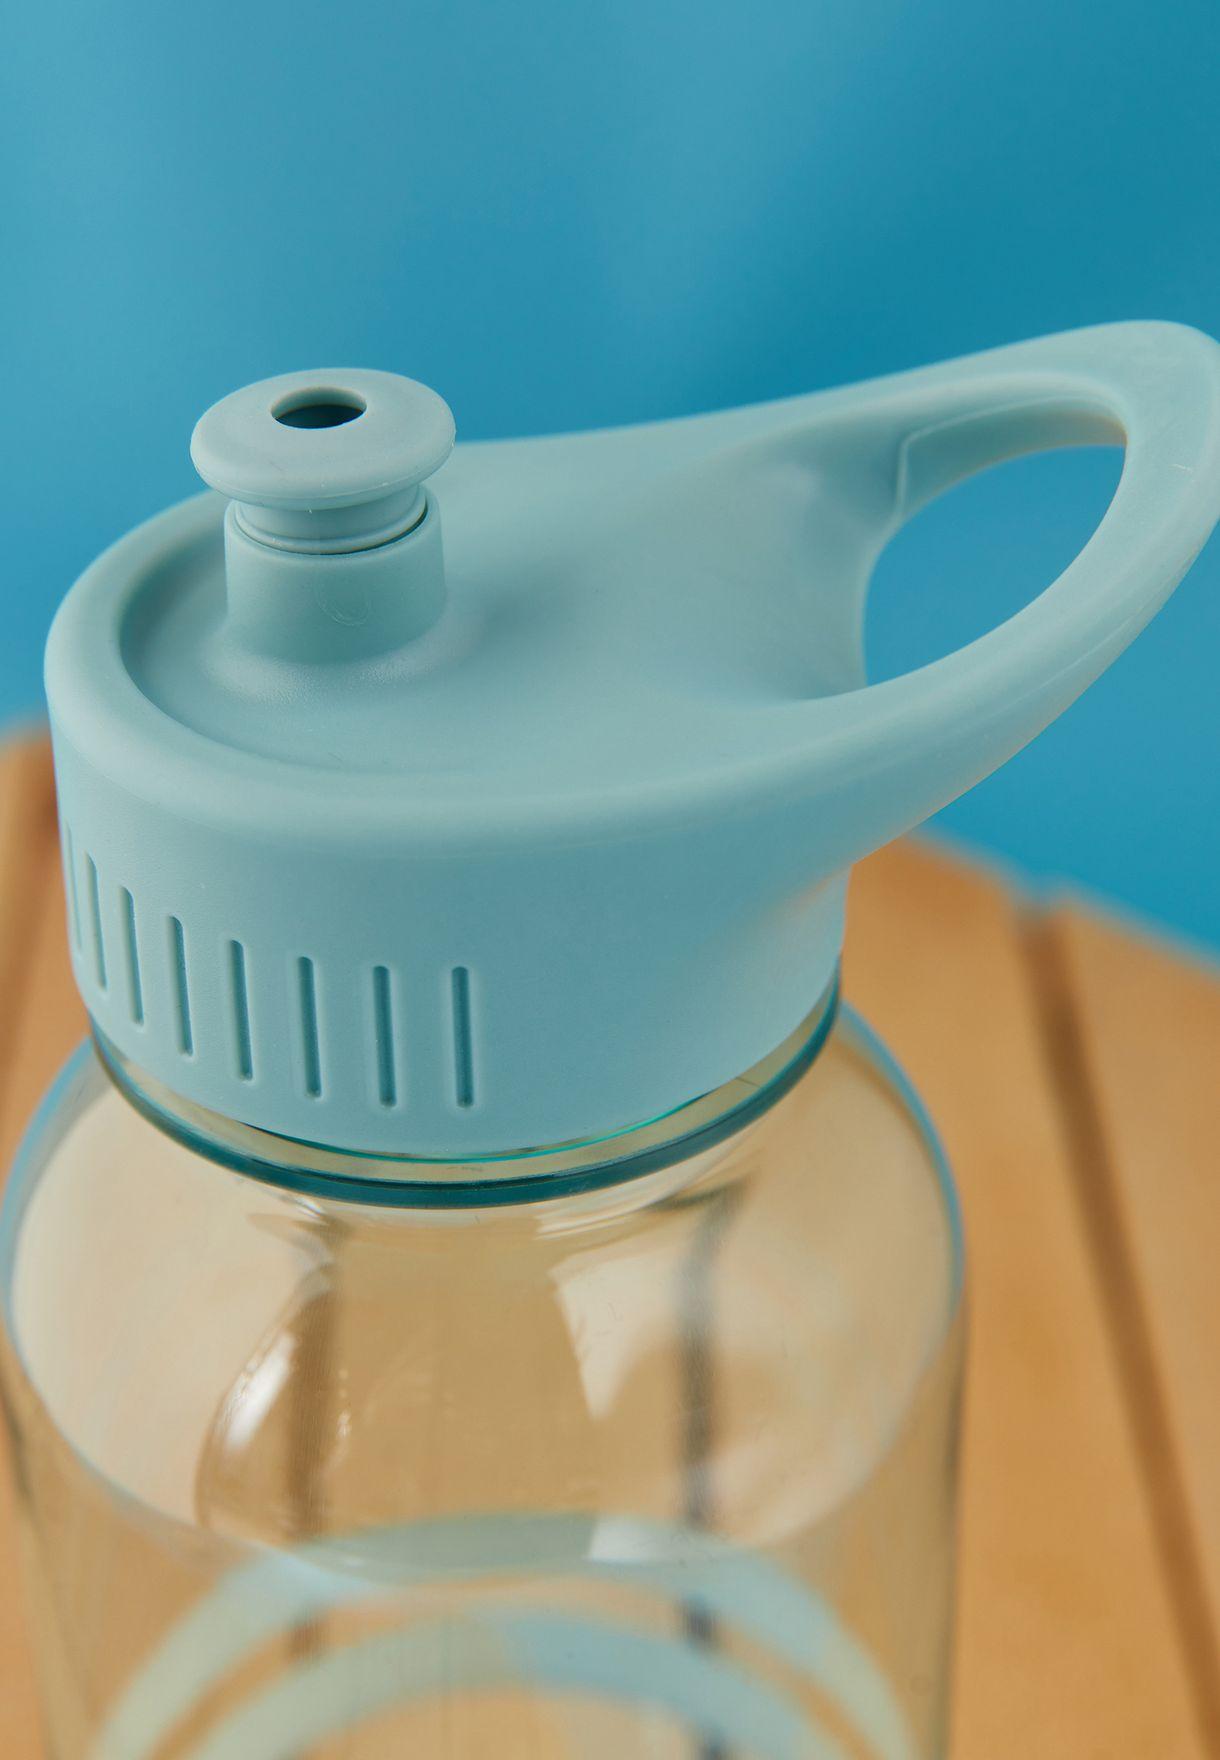 قارورة مياه مع شفاط - 1 ليتر